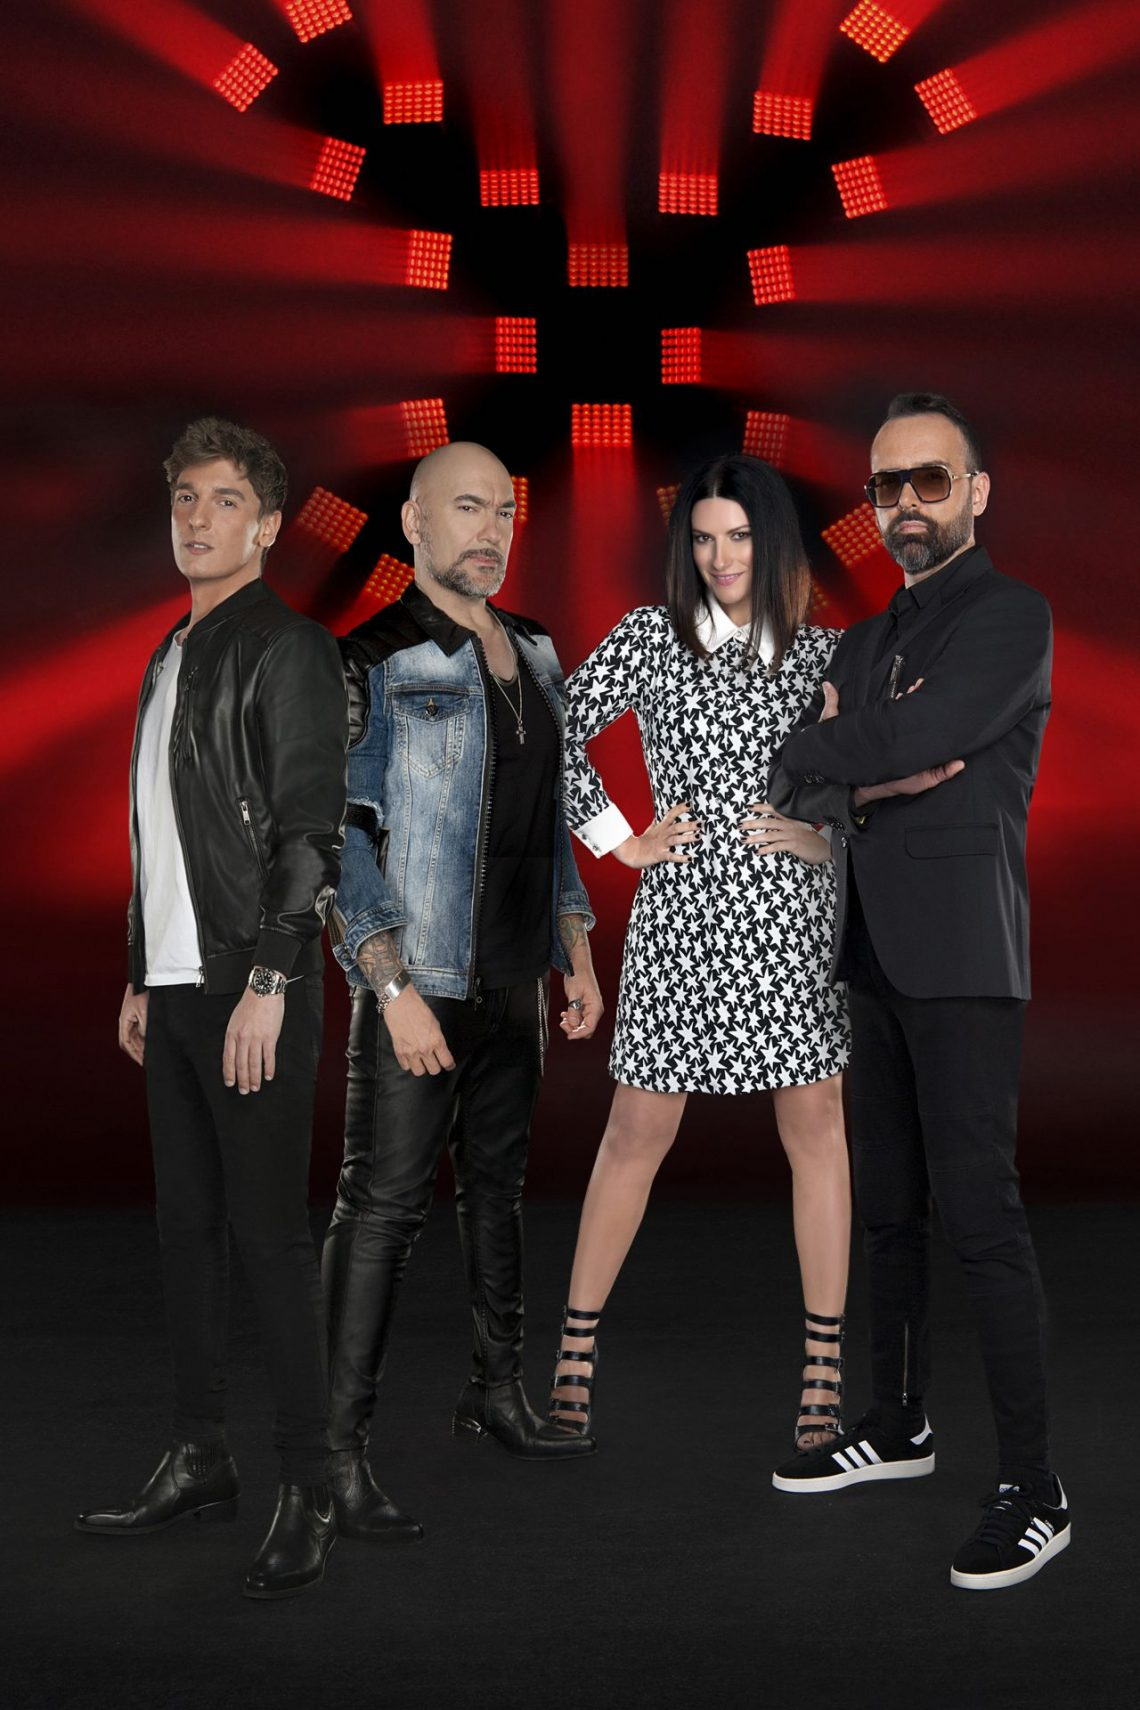 Llega a España 'Factor X', el talent musical de mayor éxito mundial